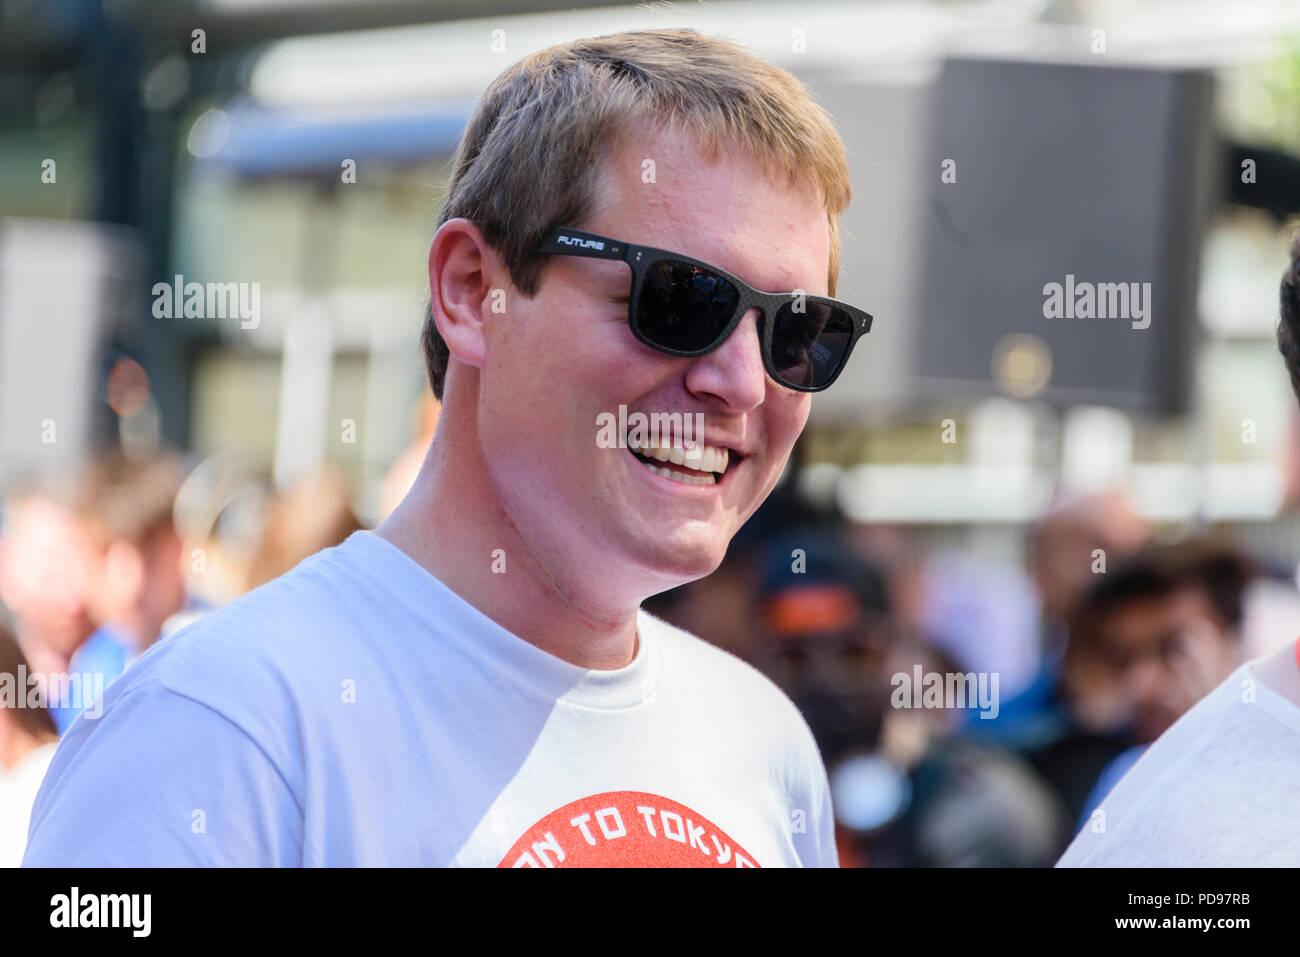 Covent Garden, London, UK.  05/08/2018.  @Schmee150 (Tim Burton) at the start of the 2018 Gumballl 3000 rally. Stock Photo